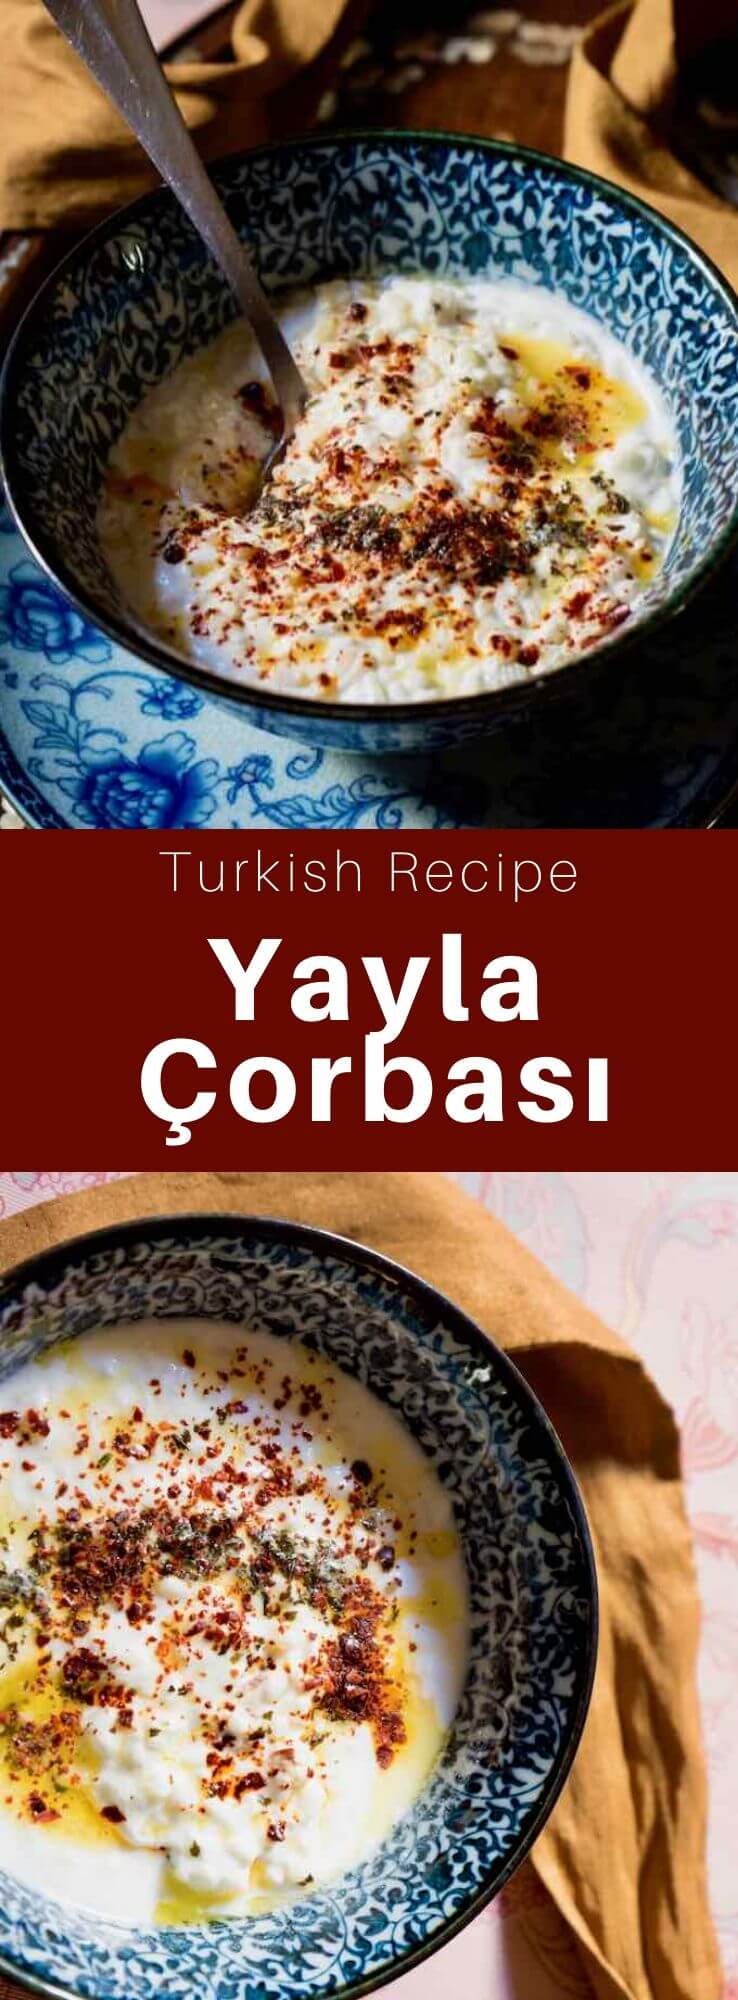 Yayla çorbası, also known as yoğurtlu çorba, is a delicious traditional Turkish yoghurt and rice soup, that is flavored with mint. #Turkey #Turkish #TurkishRecipe #TurkishFood #TurkishCuisine #WorldCuisine #196flavors